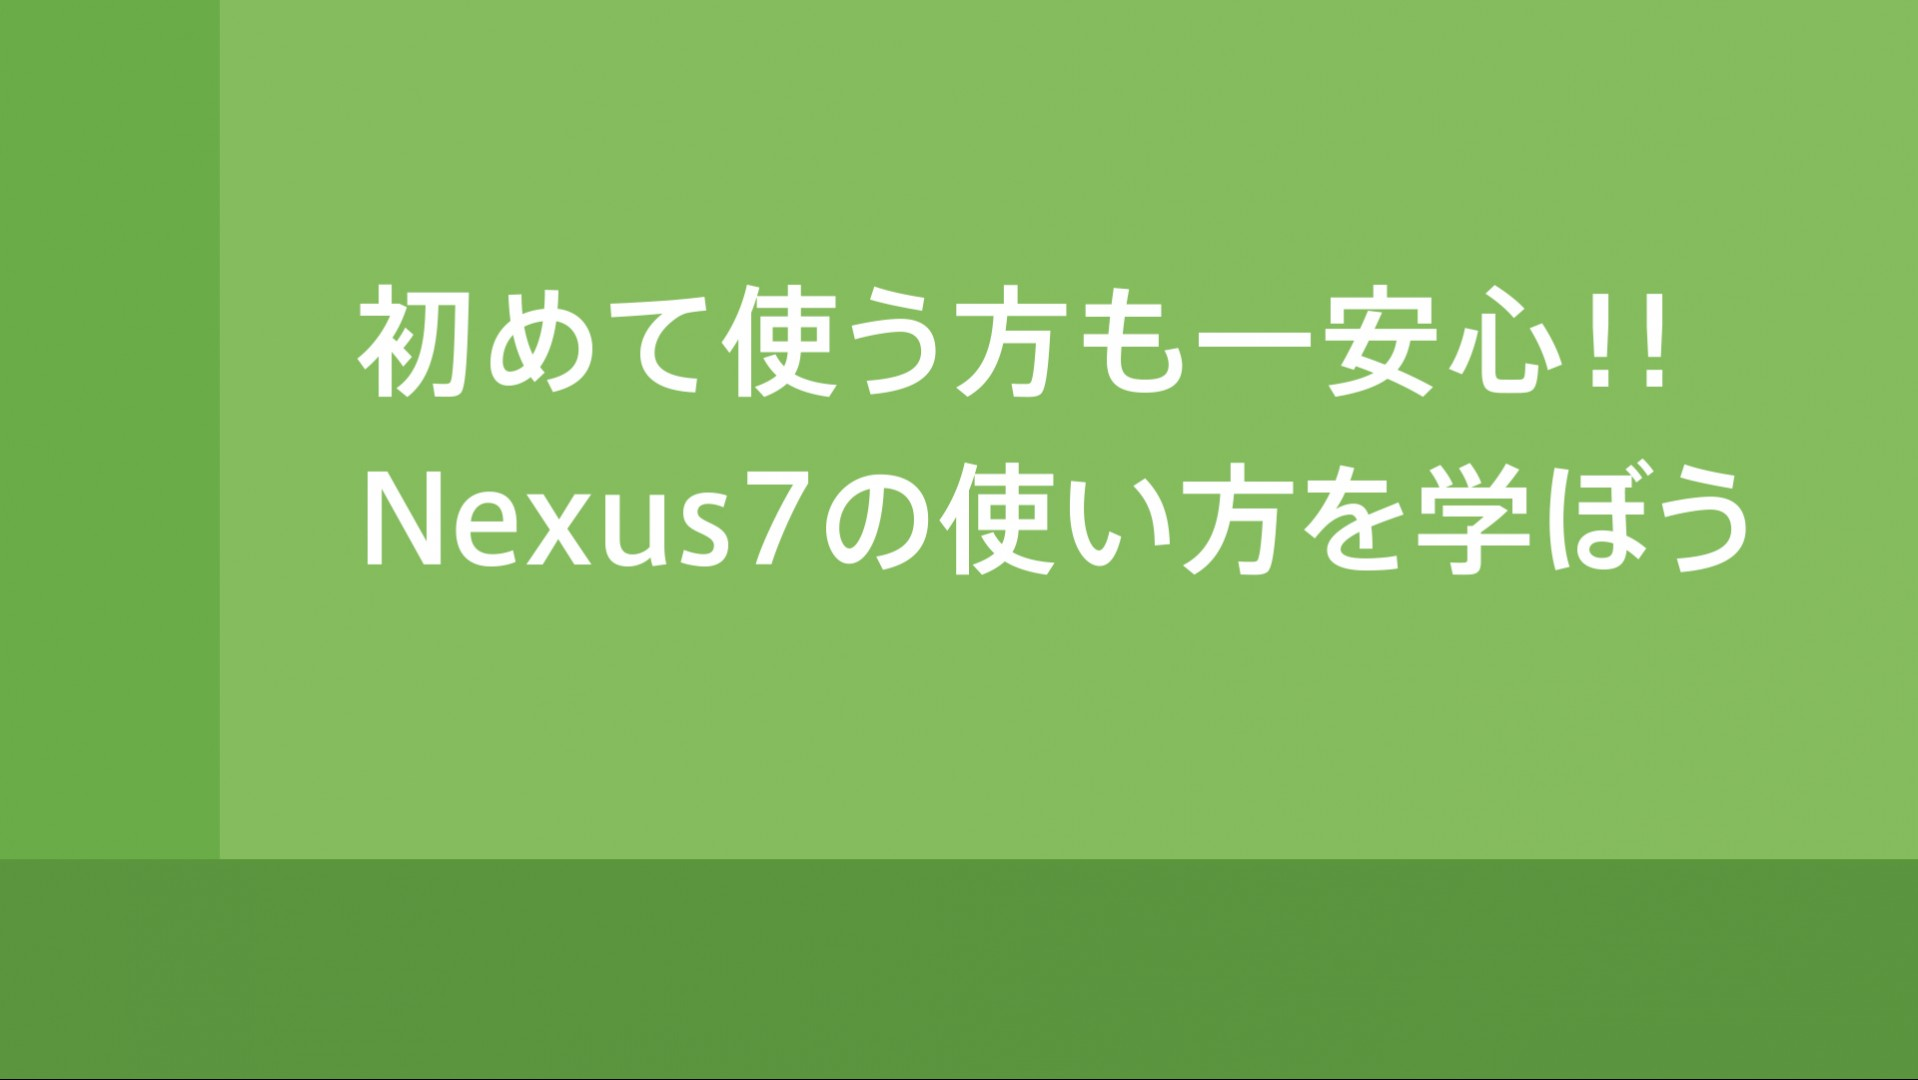 Nexus7 でウェブ閲覧 シークレットタブを使う